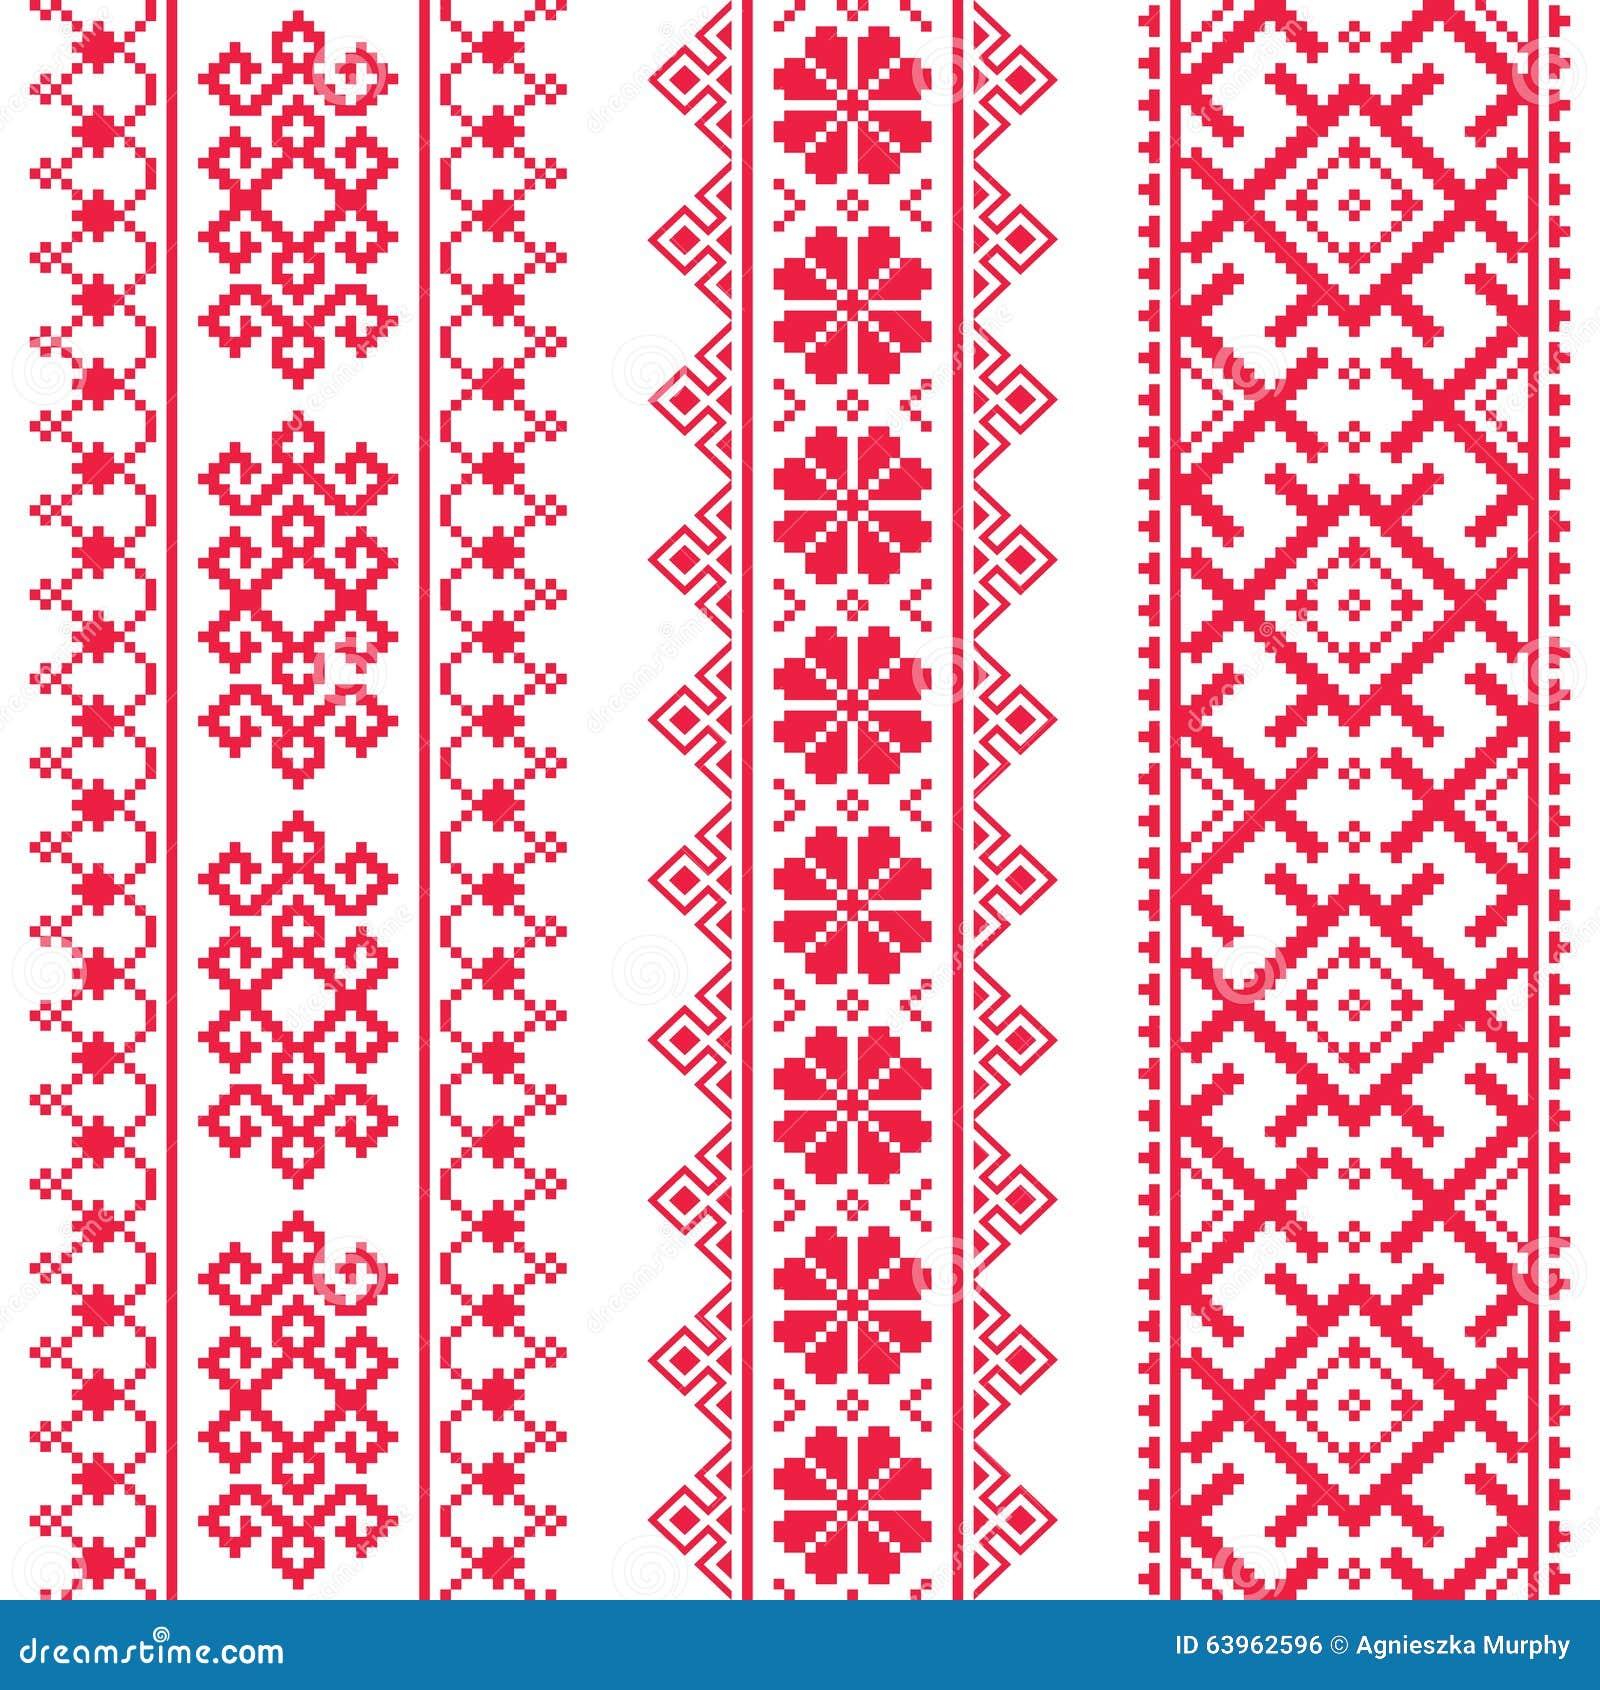 Ukrainian, Belarusian Red Embroidery Seamless Pattern